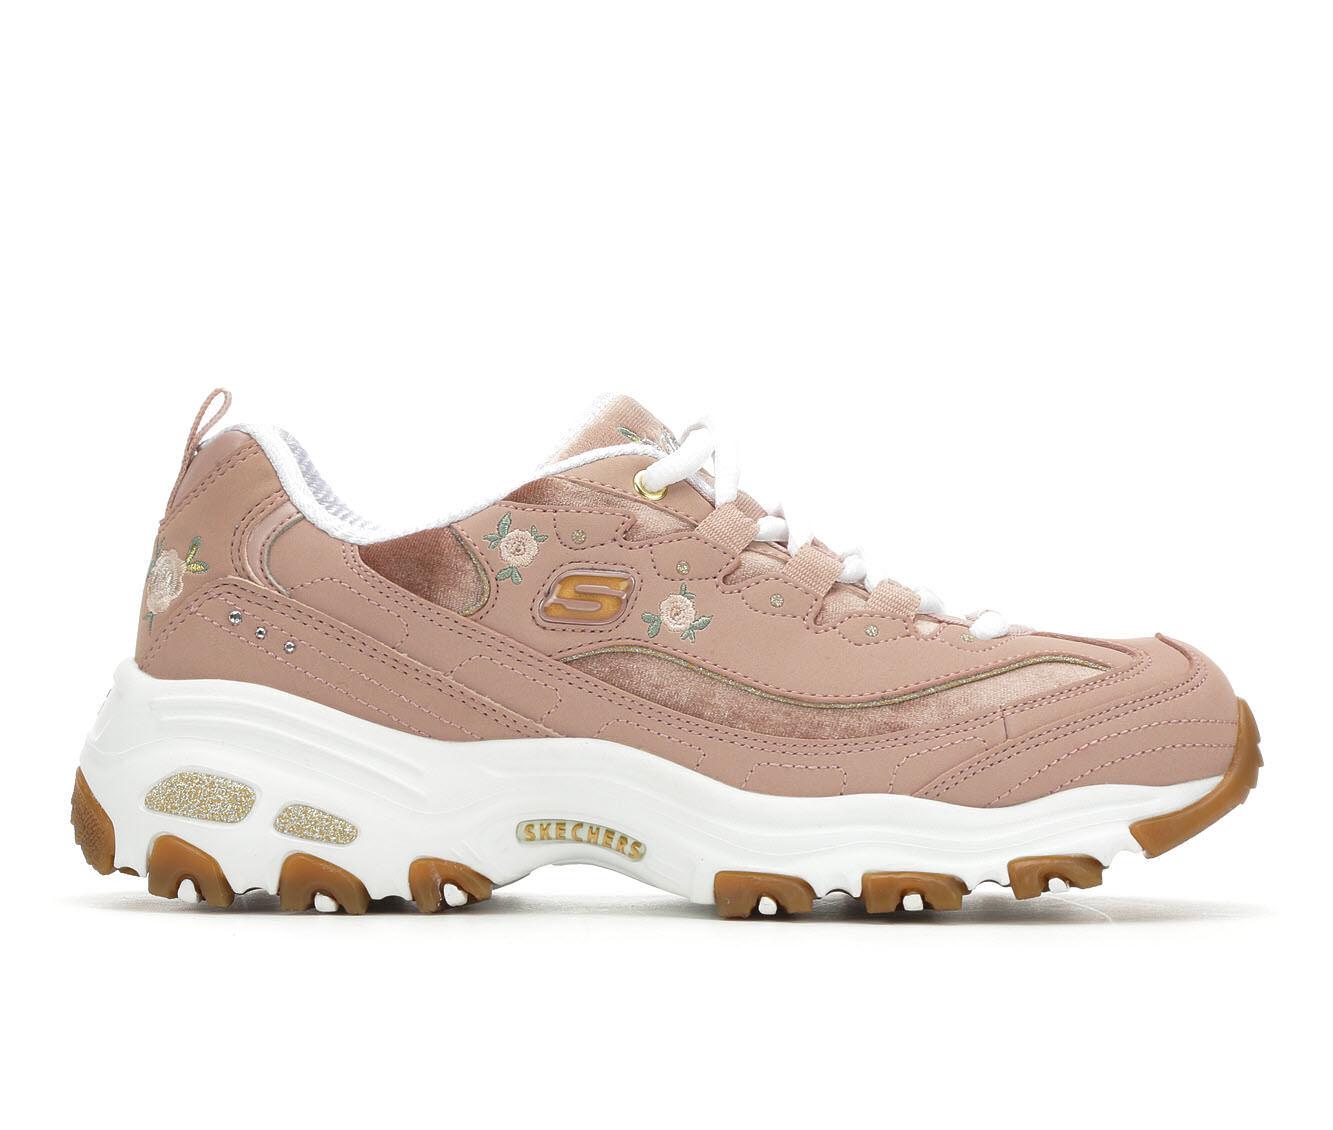 Women's Skechers D'Lites Rose Blooms 13084 Sneakers Rose/White/Gum